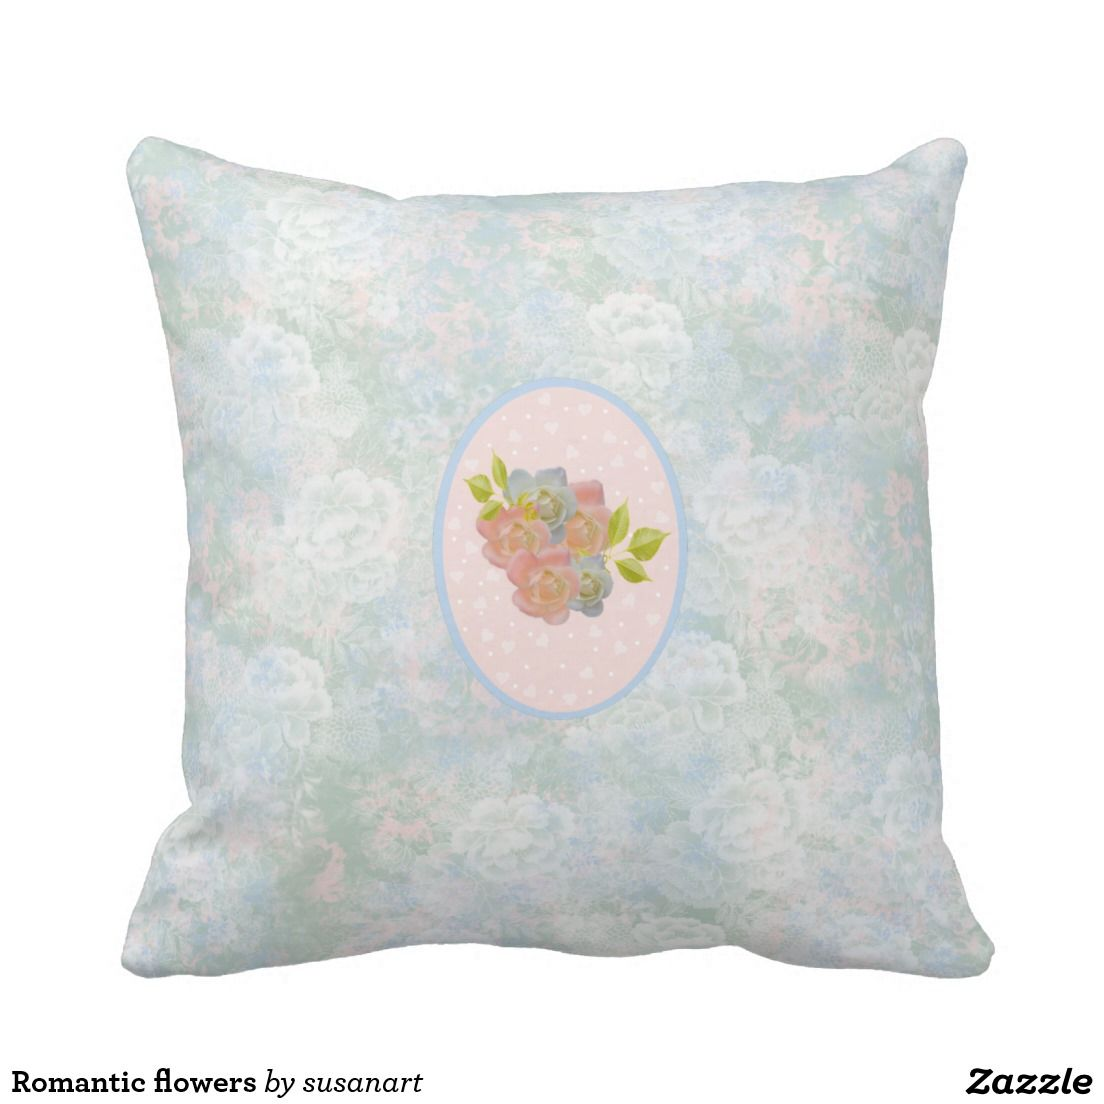 Romantic flowers pillows